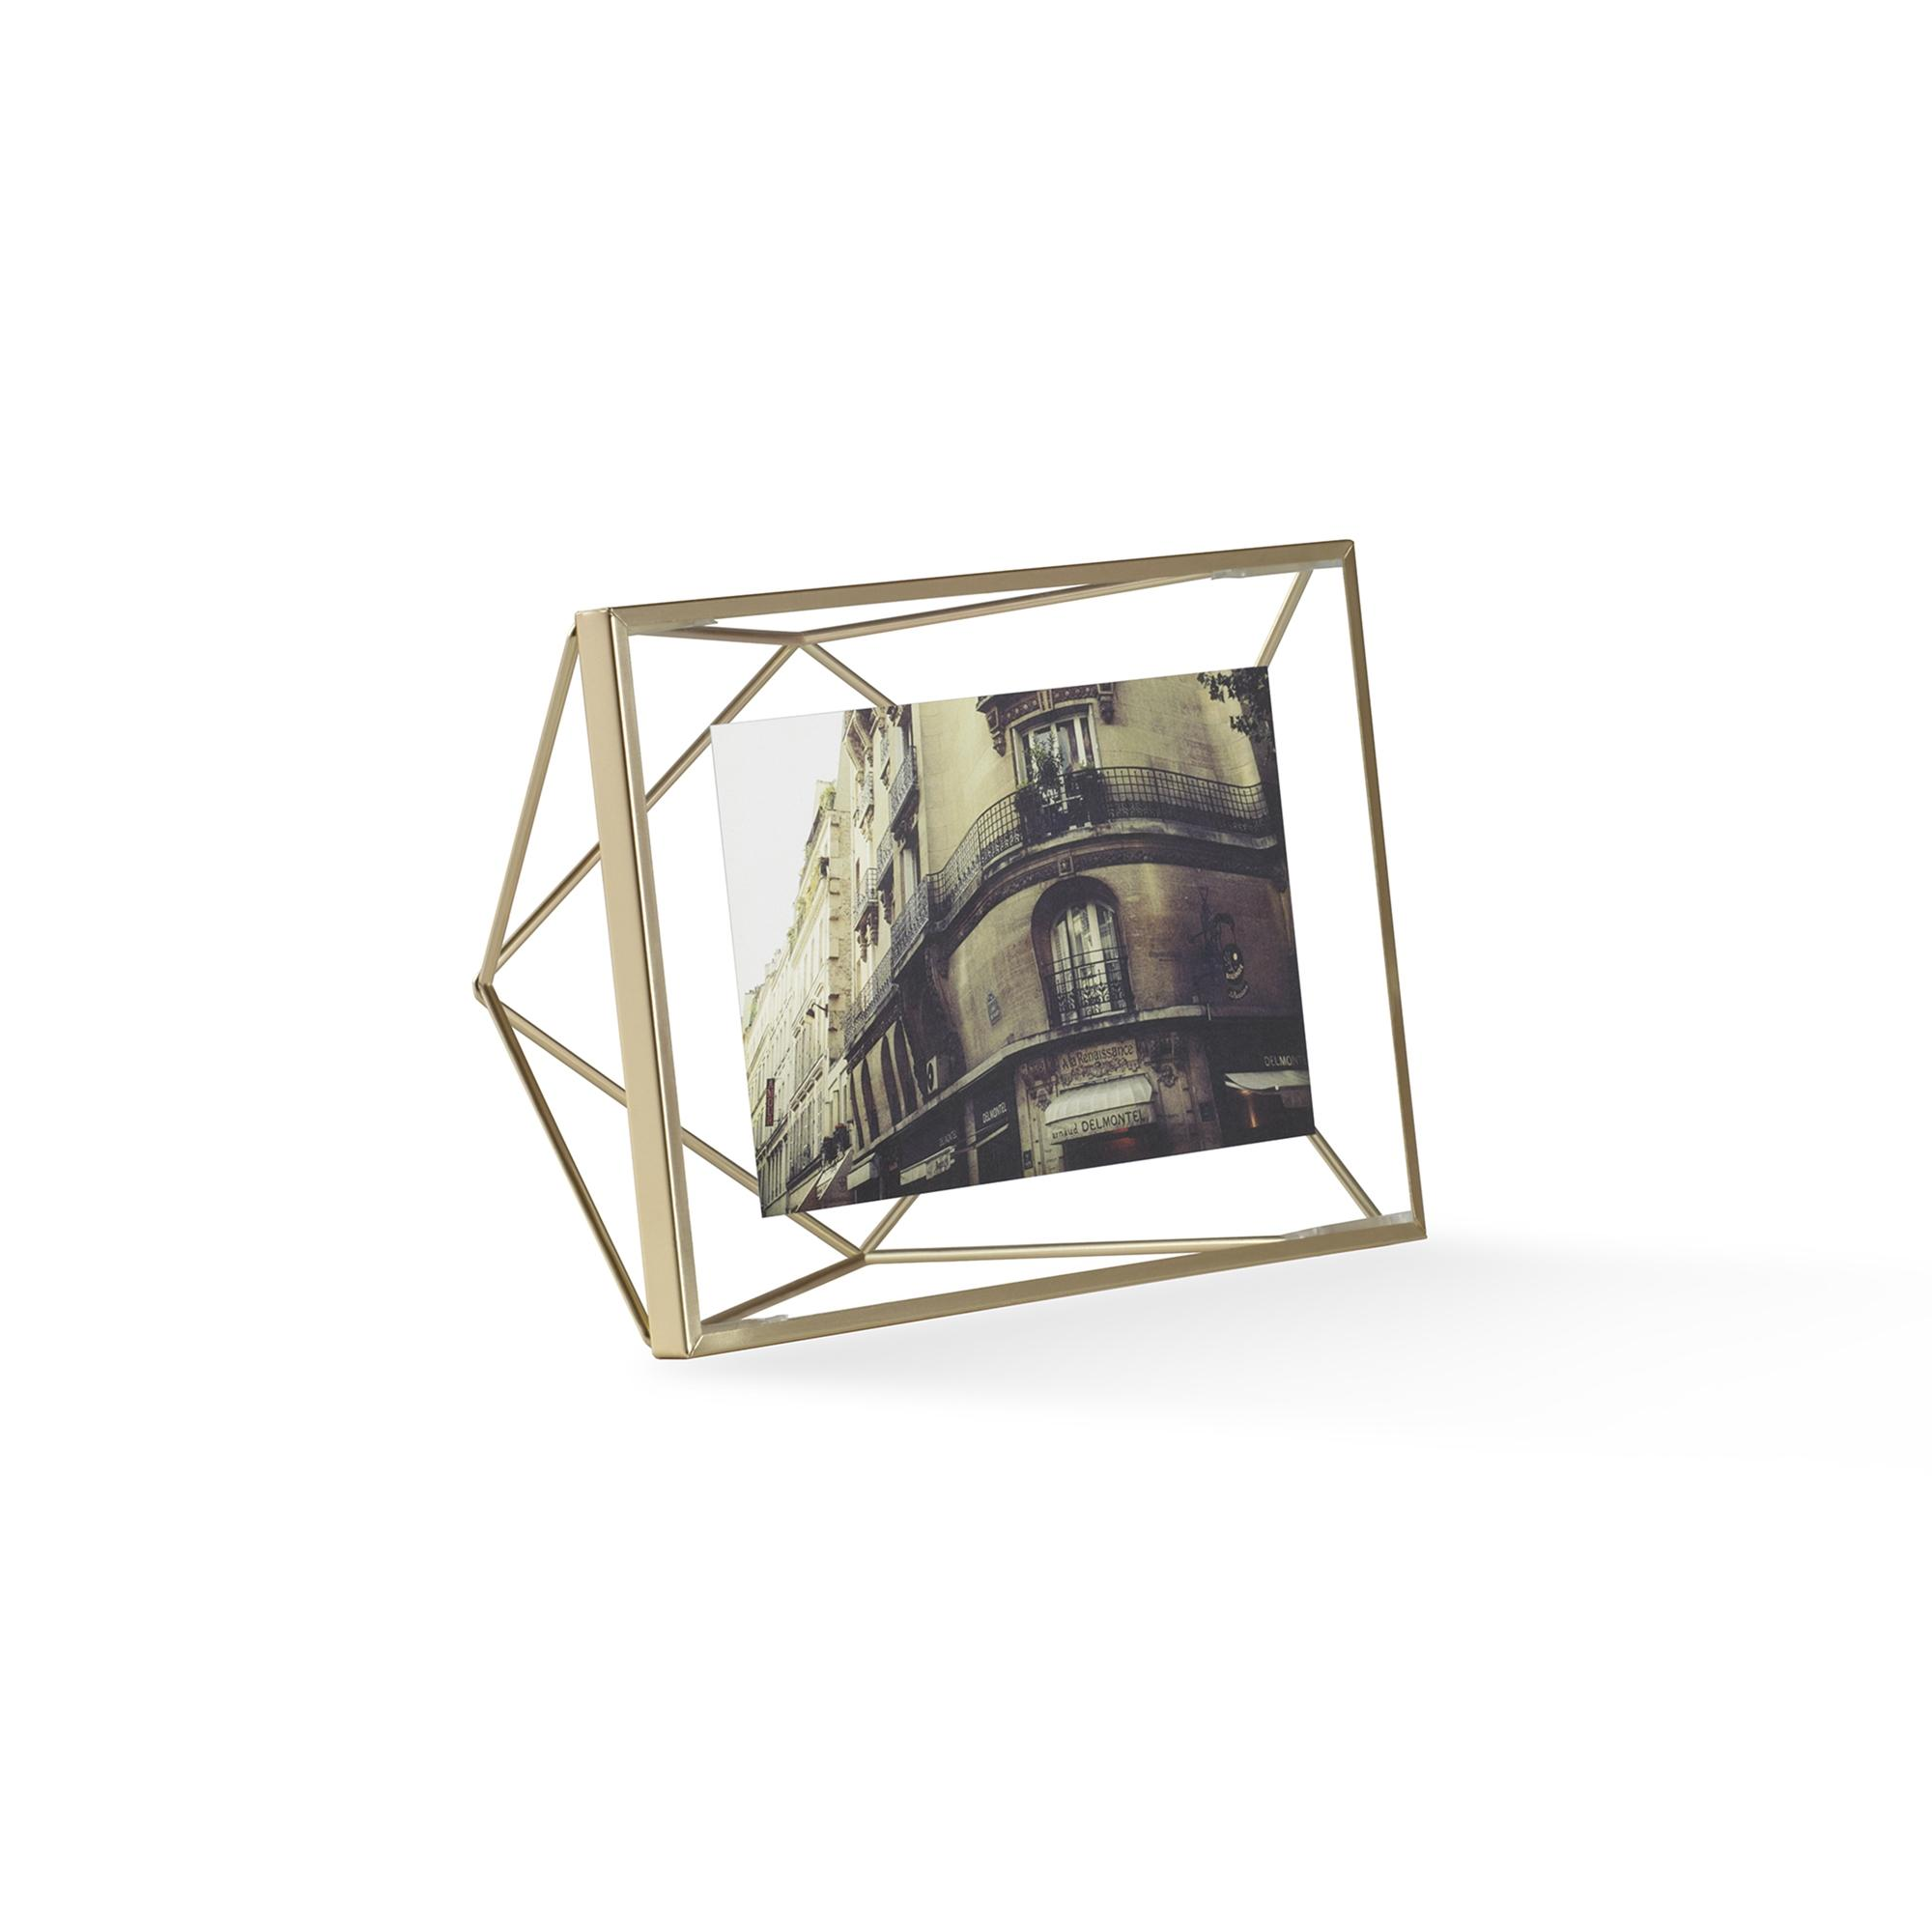 Umbra Prisma Photo Frame 4 x 6 - Matte Brass